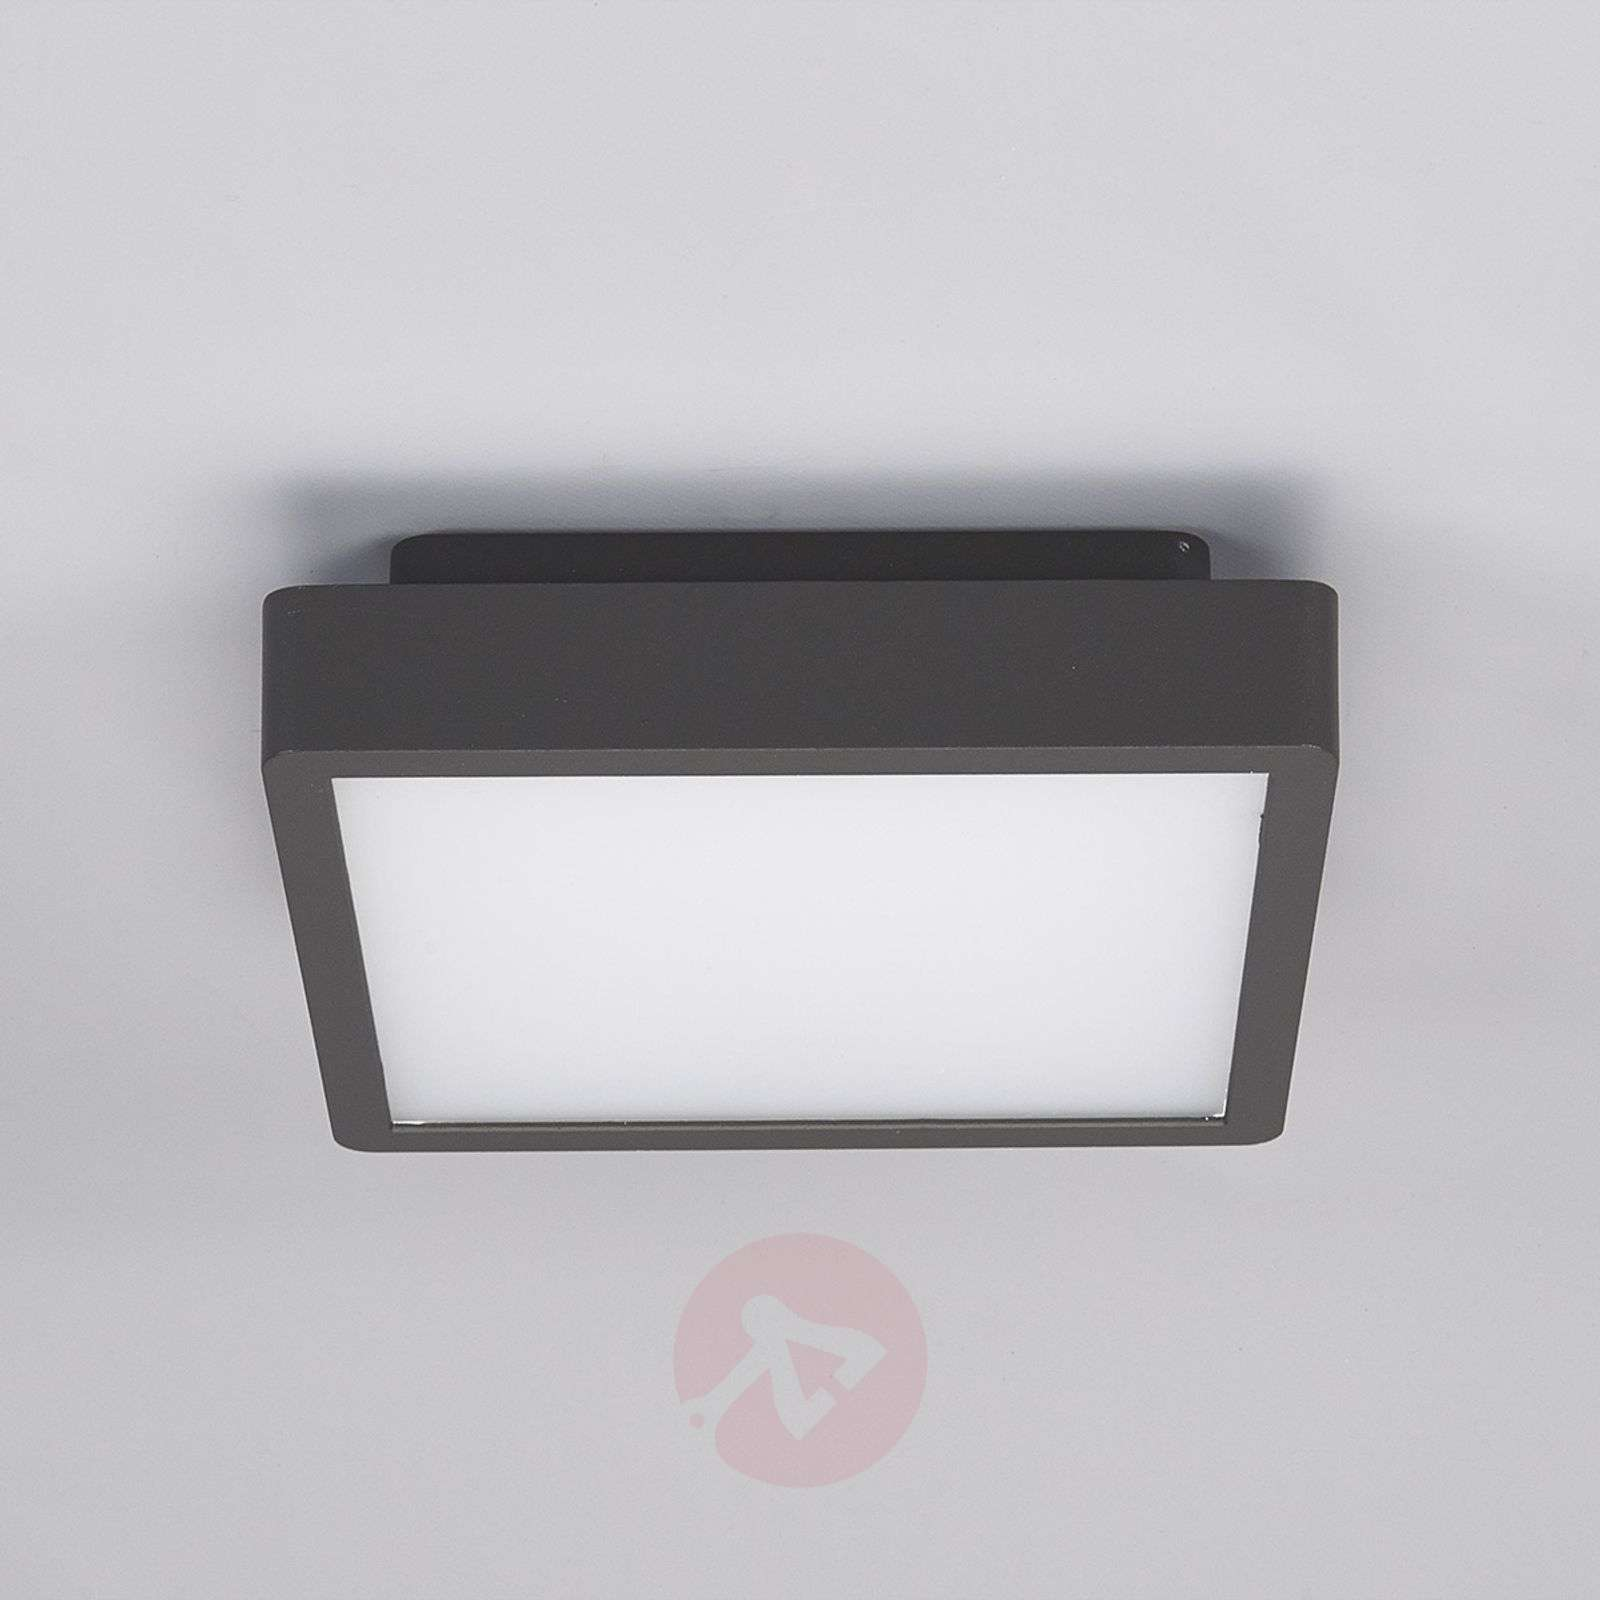 linea professional light gb i lighting lights original group cube outdoor en ceiling